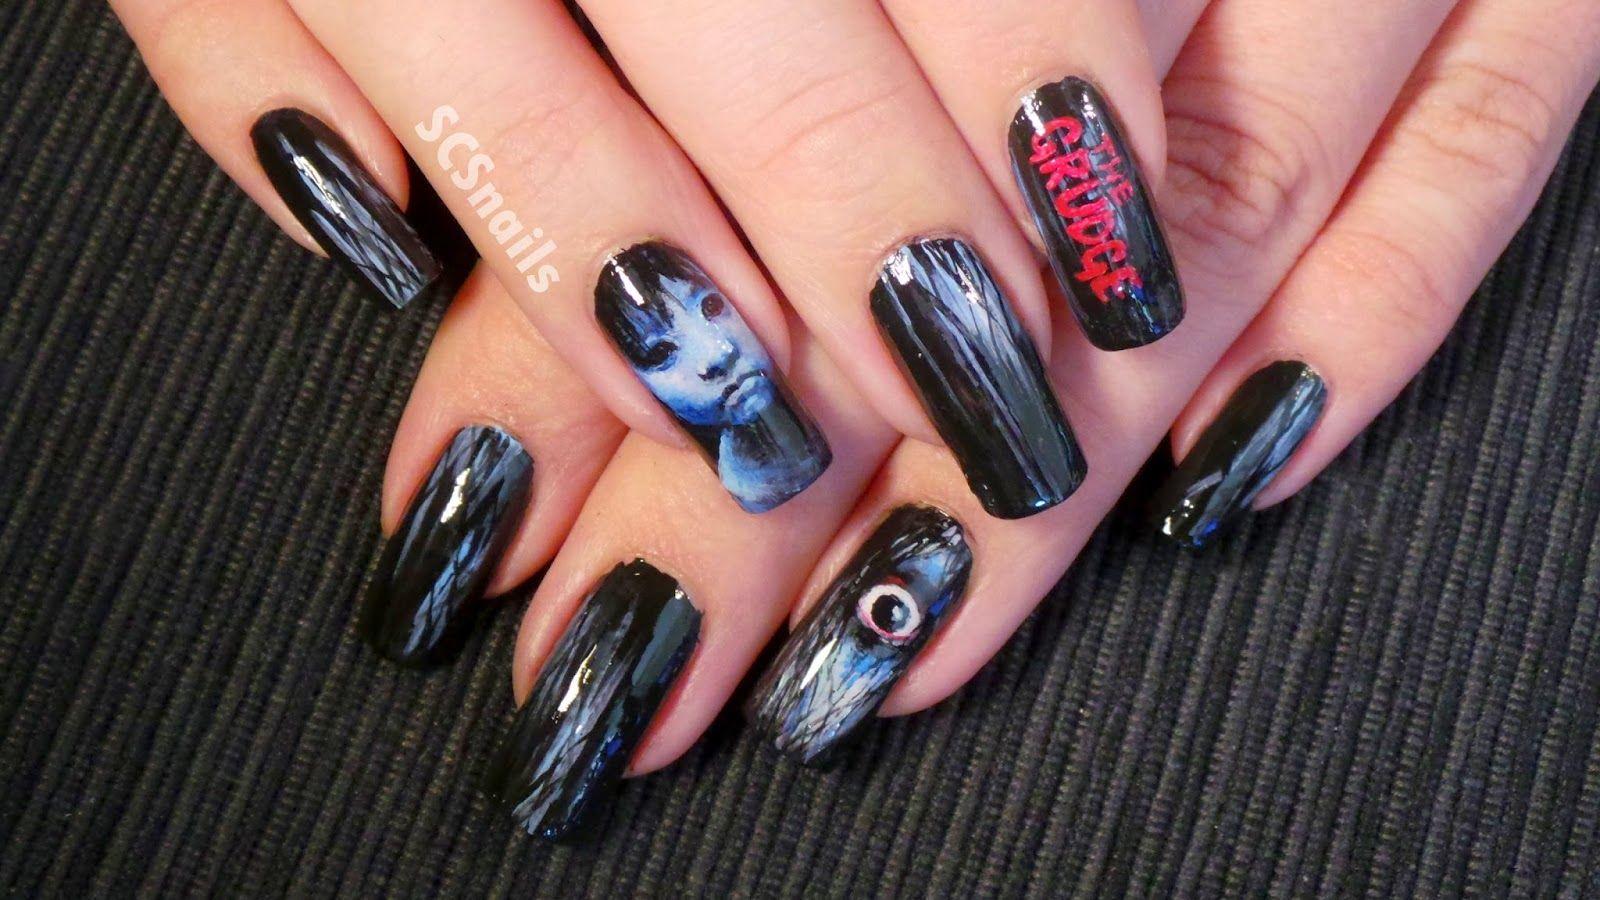 SCS nails | Scary nail art